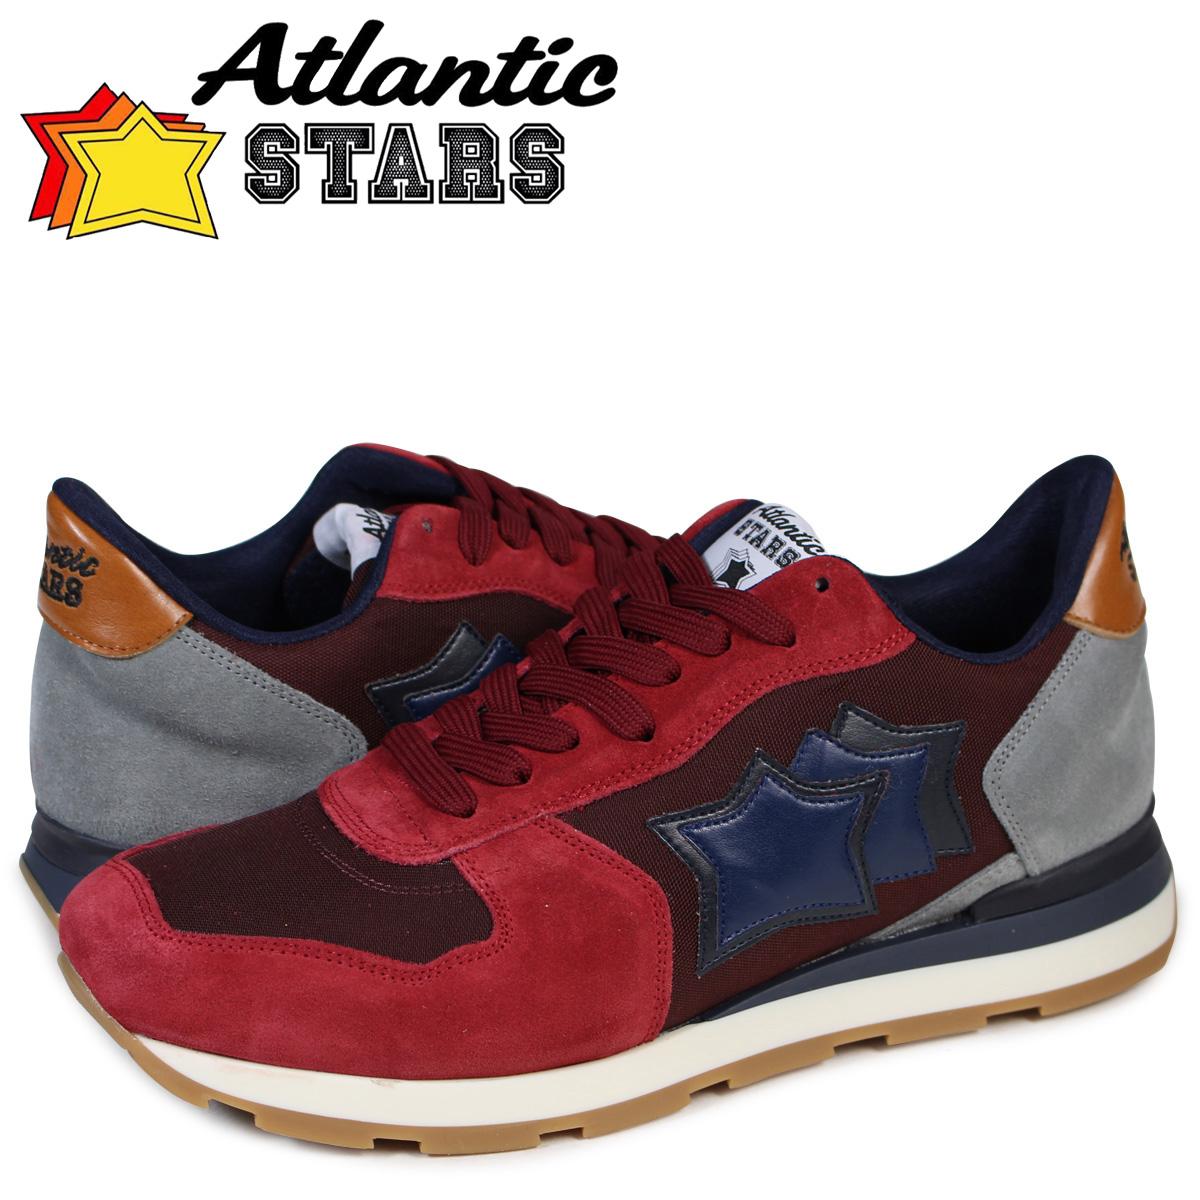 Atlantic STARS メンズ スニーカー アトランティックスターズ アンタレス ANTARES GGB-21NY 靴 バーガンディー